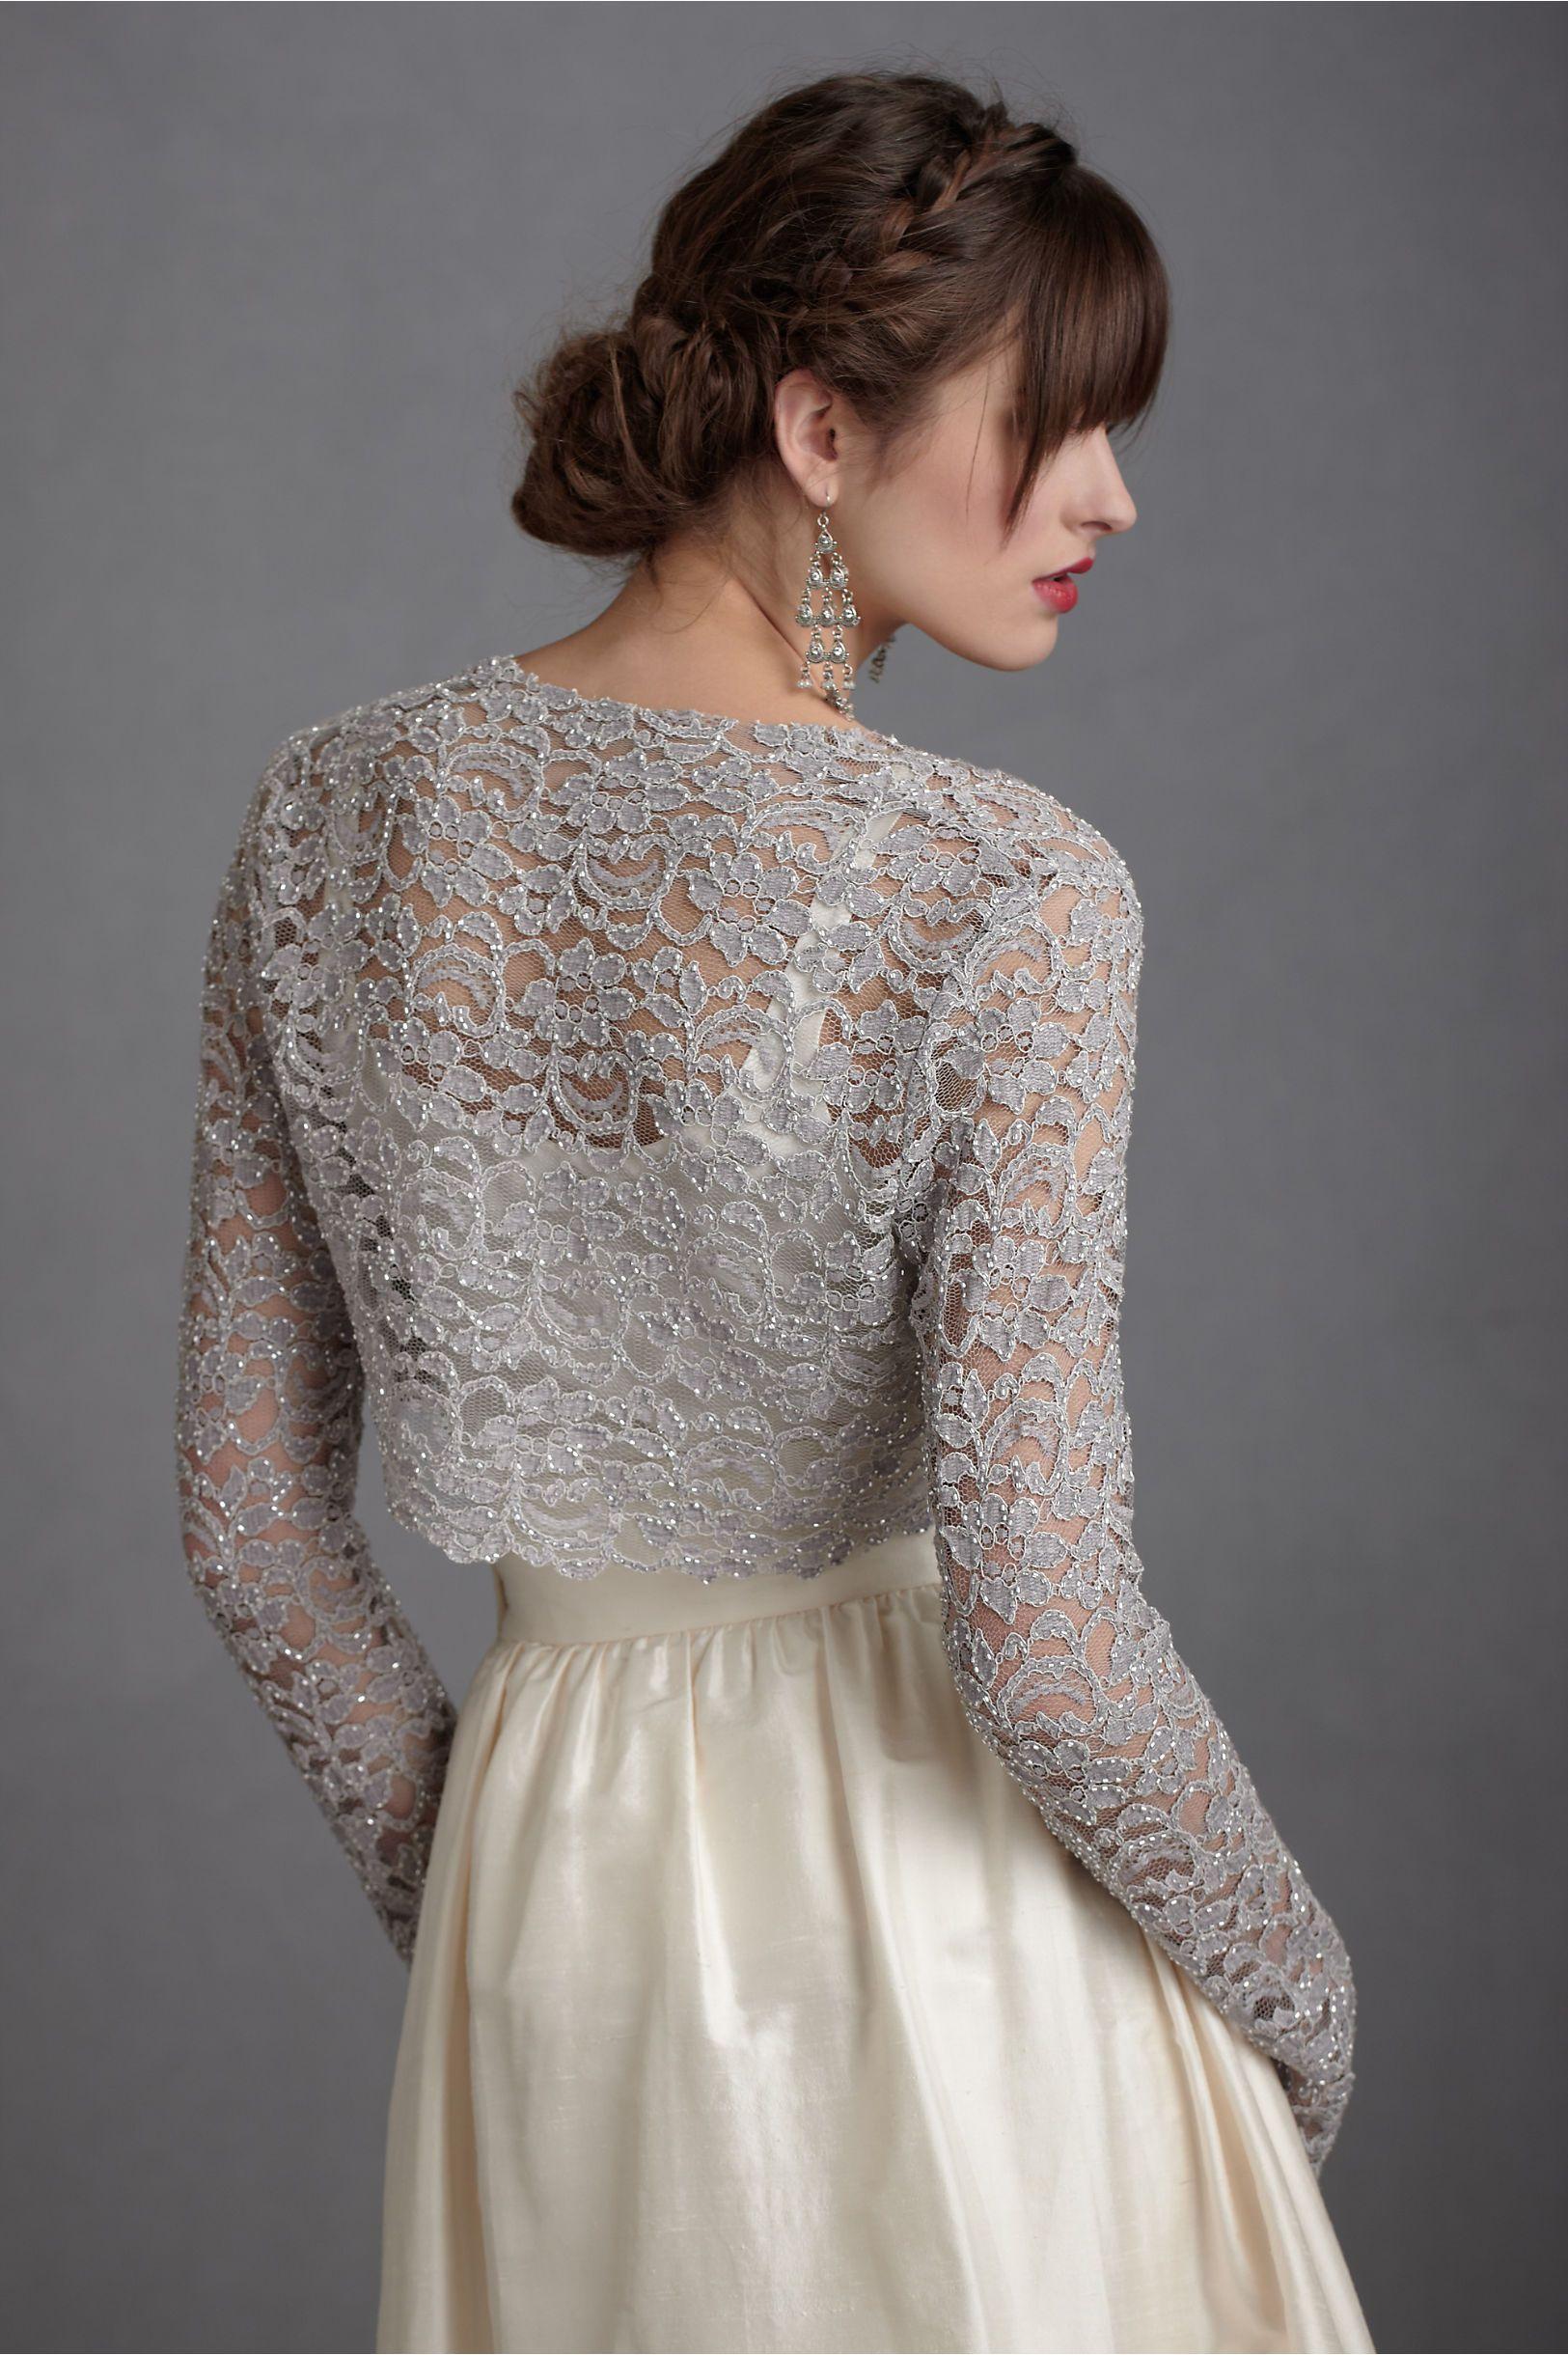 Lady Grey Shrug From Bhldn Clothes I Love Pinterest